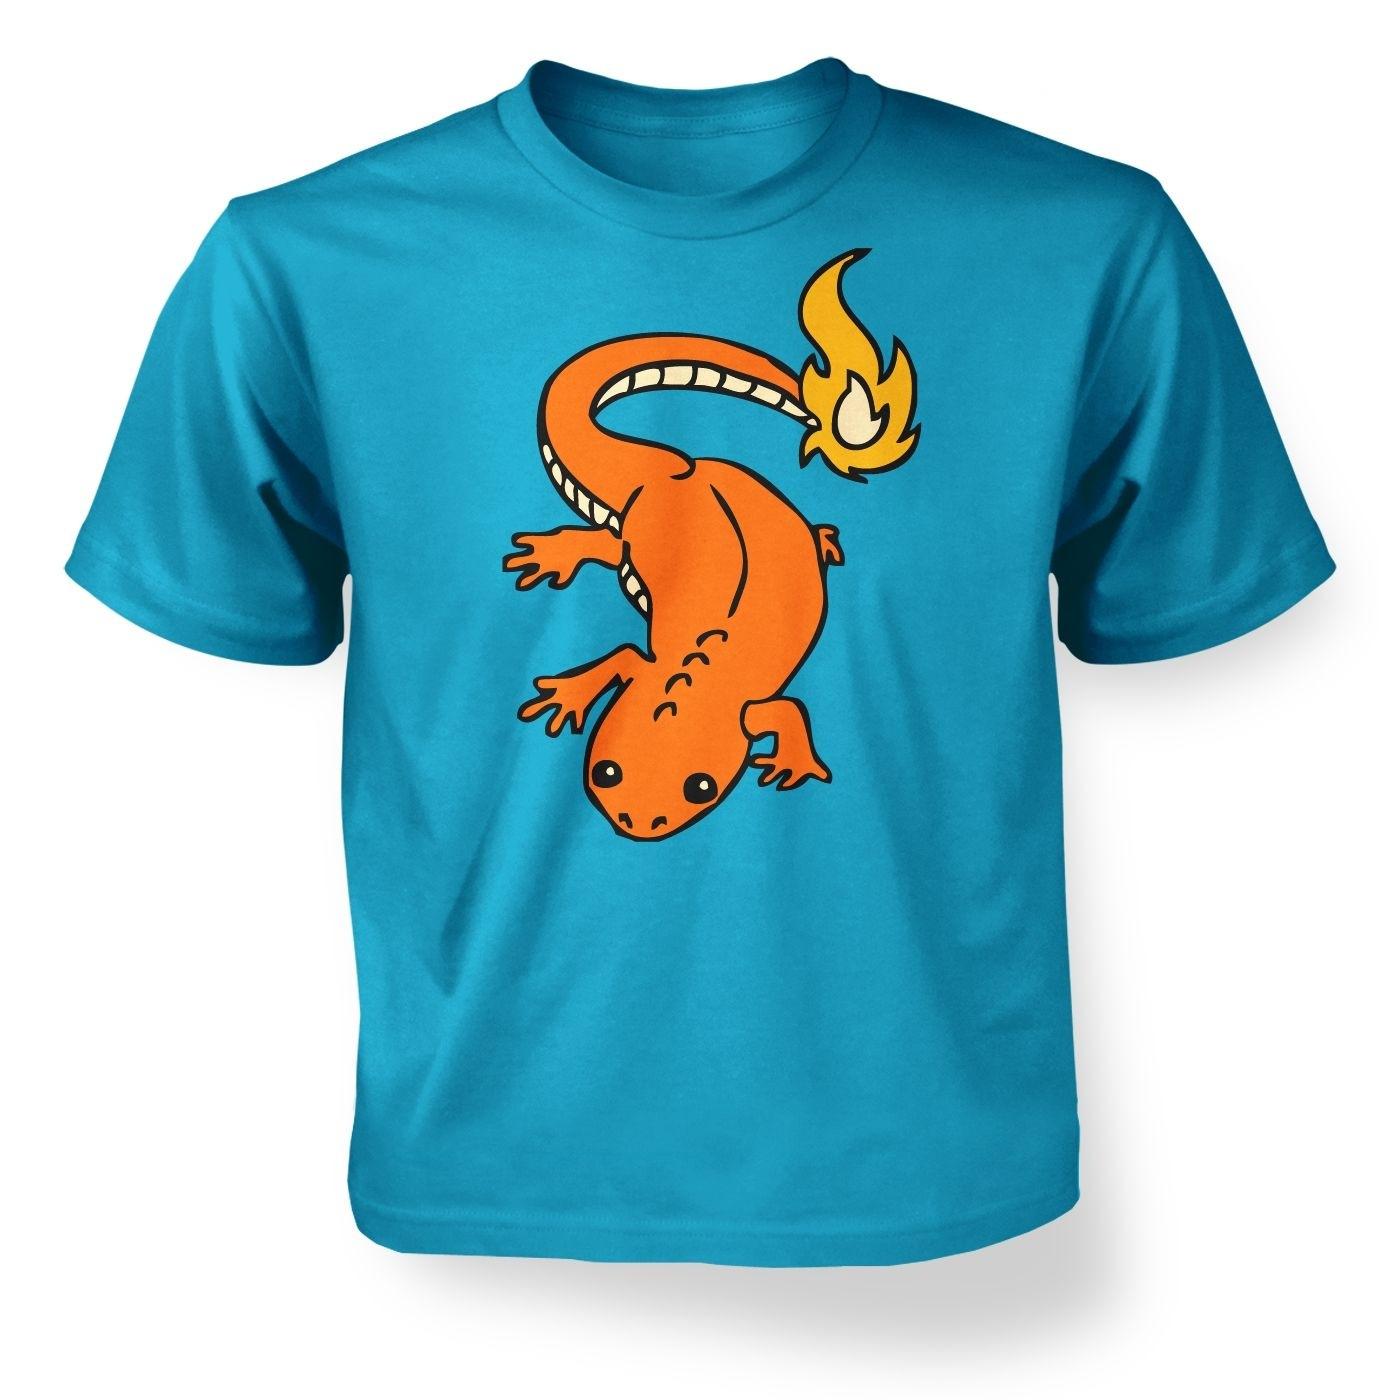 Kids' Real Life Charmander T-Shirt - Inspired by Pokemon